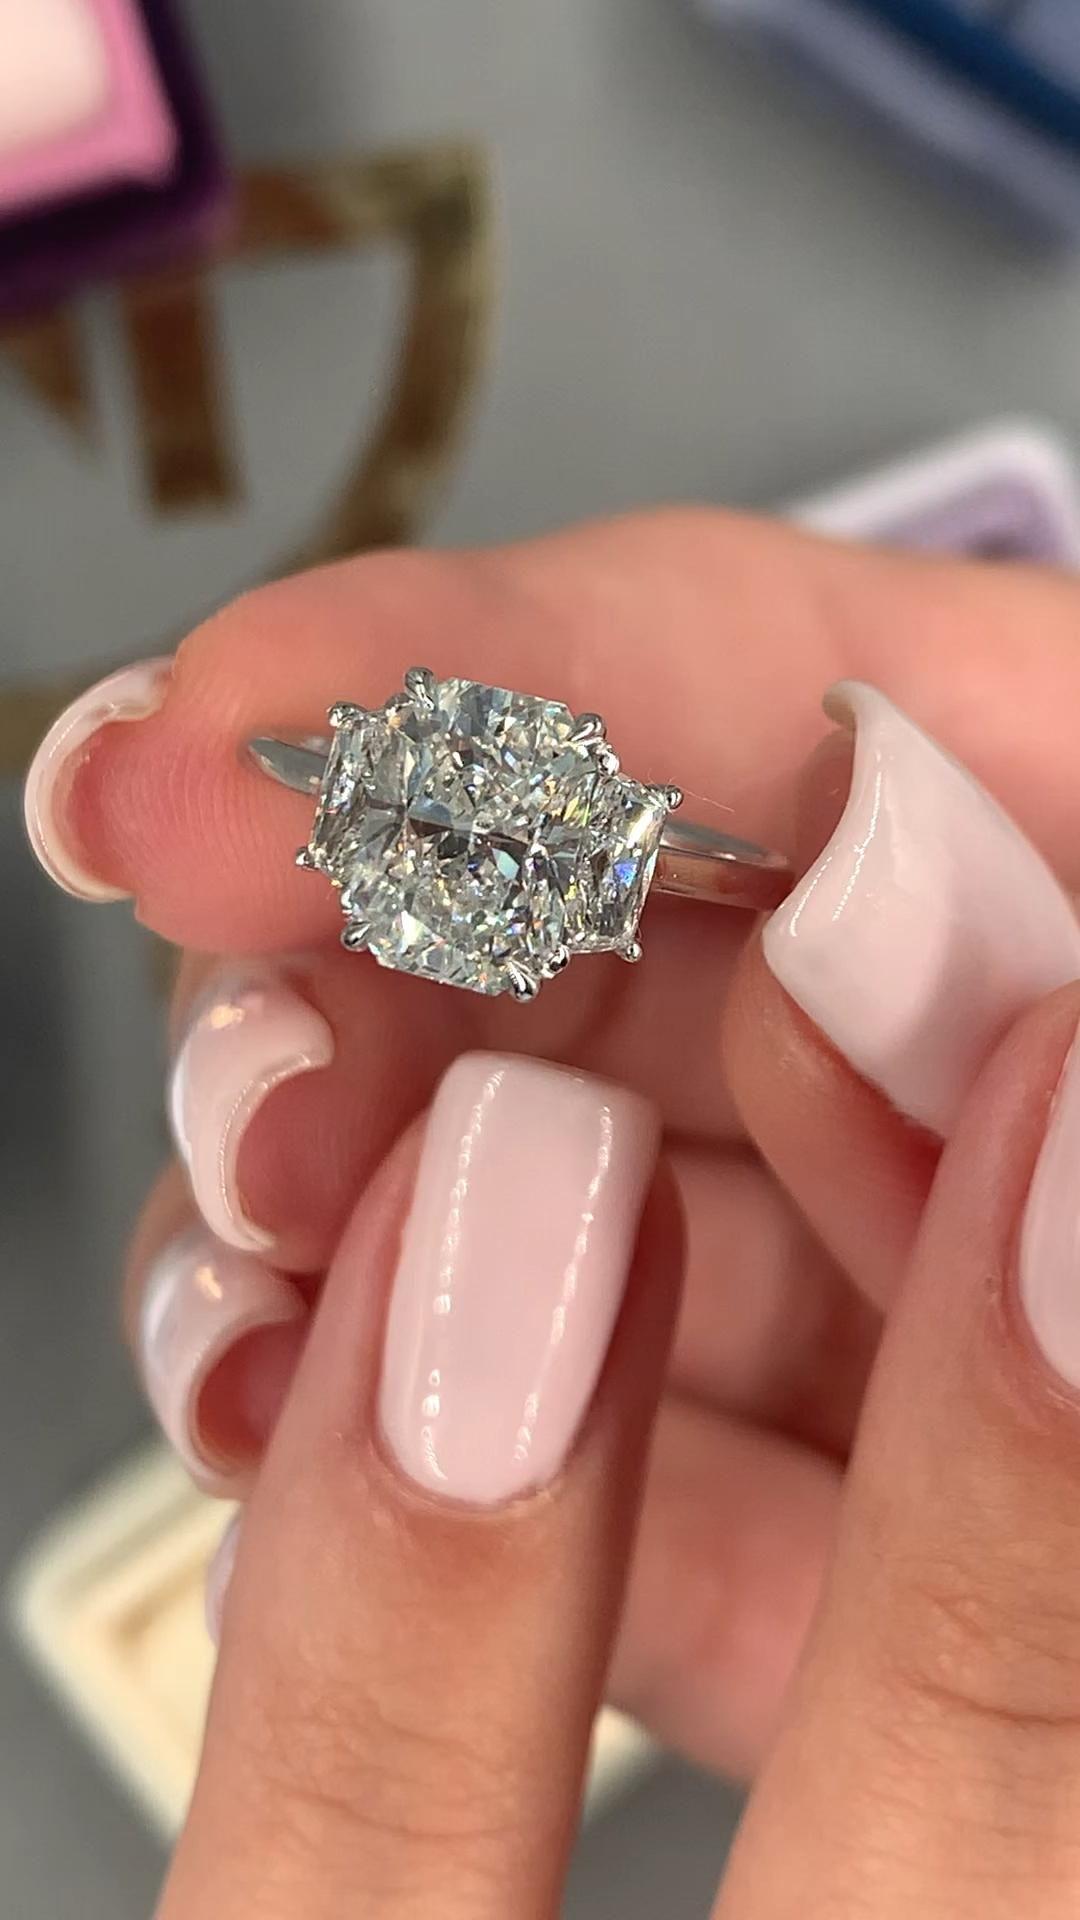 2.41 Carat Diamond Engagement Ring3 Stone Radiant Diamond | Etsy